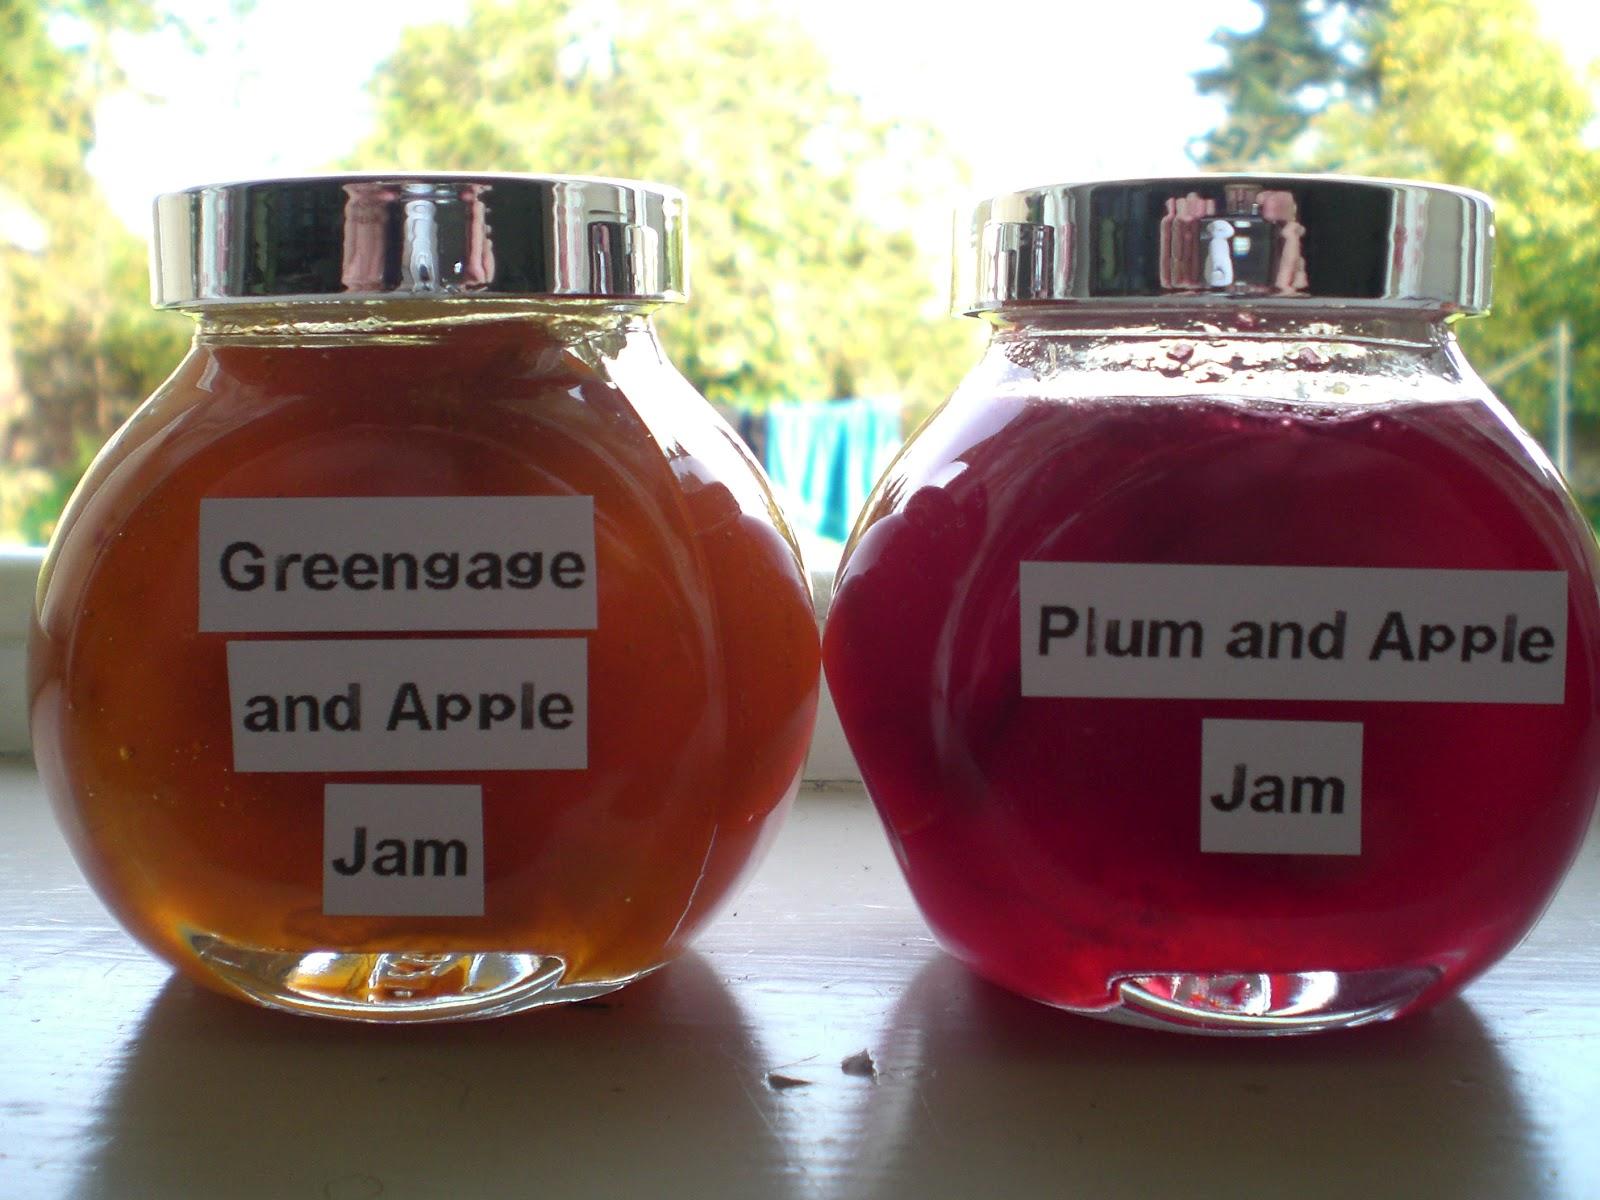 Knitorama: Margarita Friday, and Plum/Greengage and Apple Jam